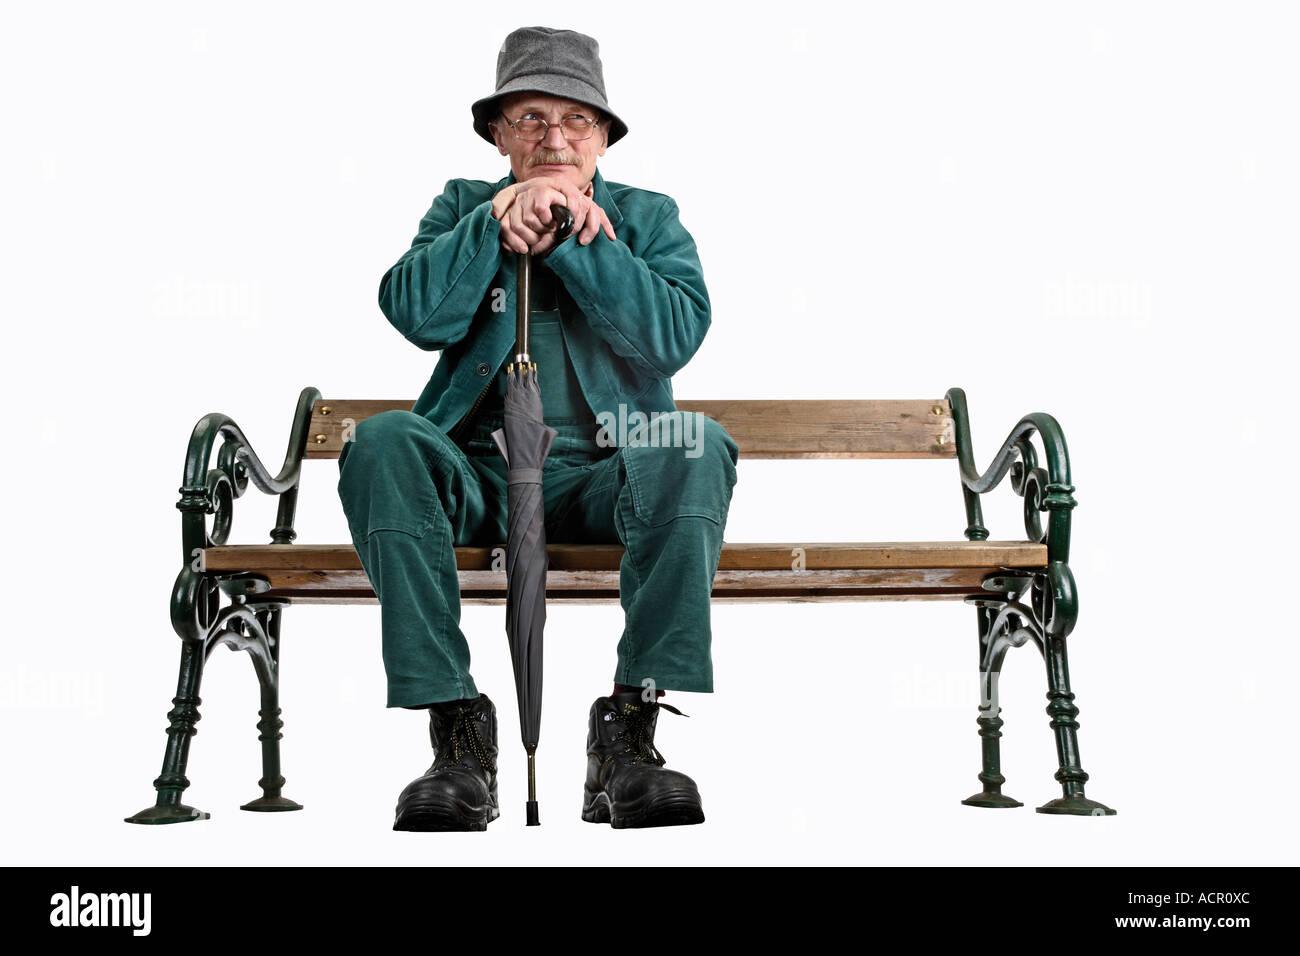 Old Man Sitting On Bench Stock Photo 7549867 Alamy